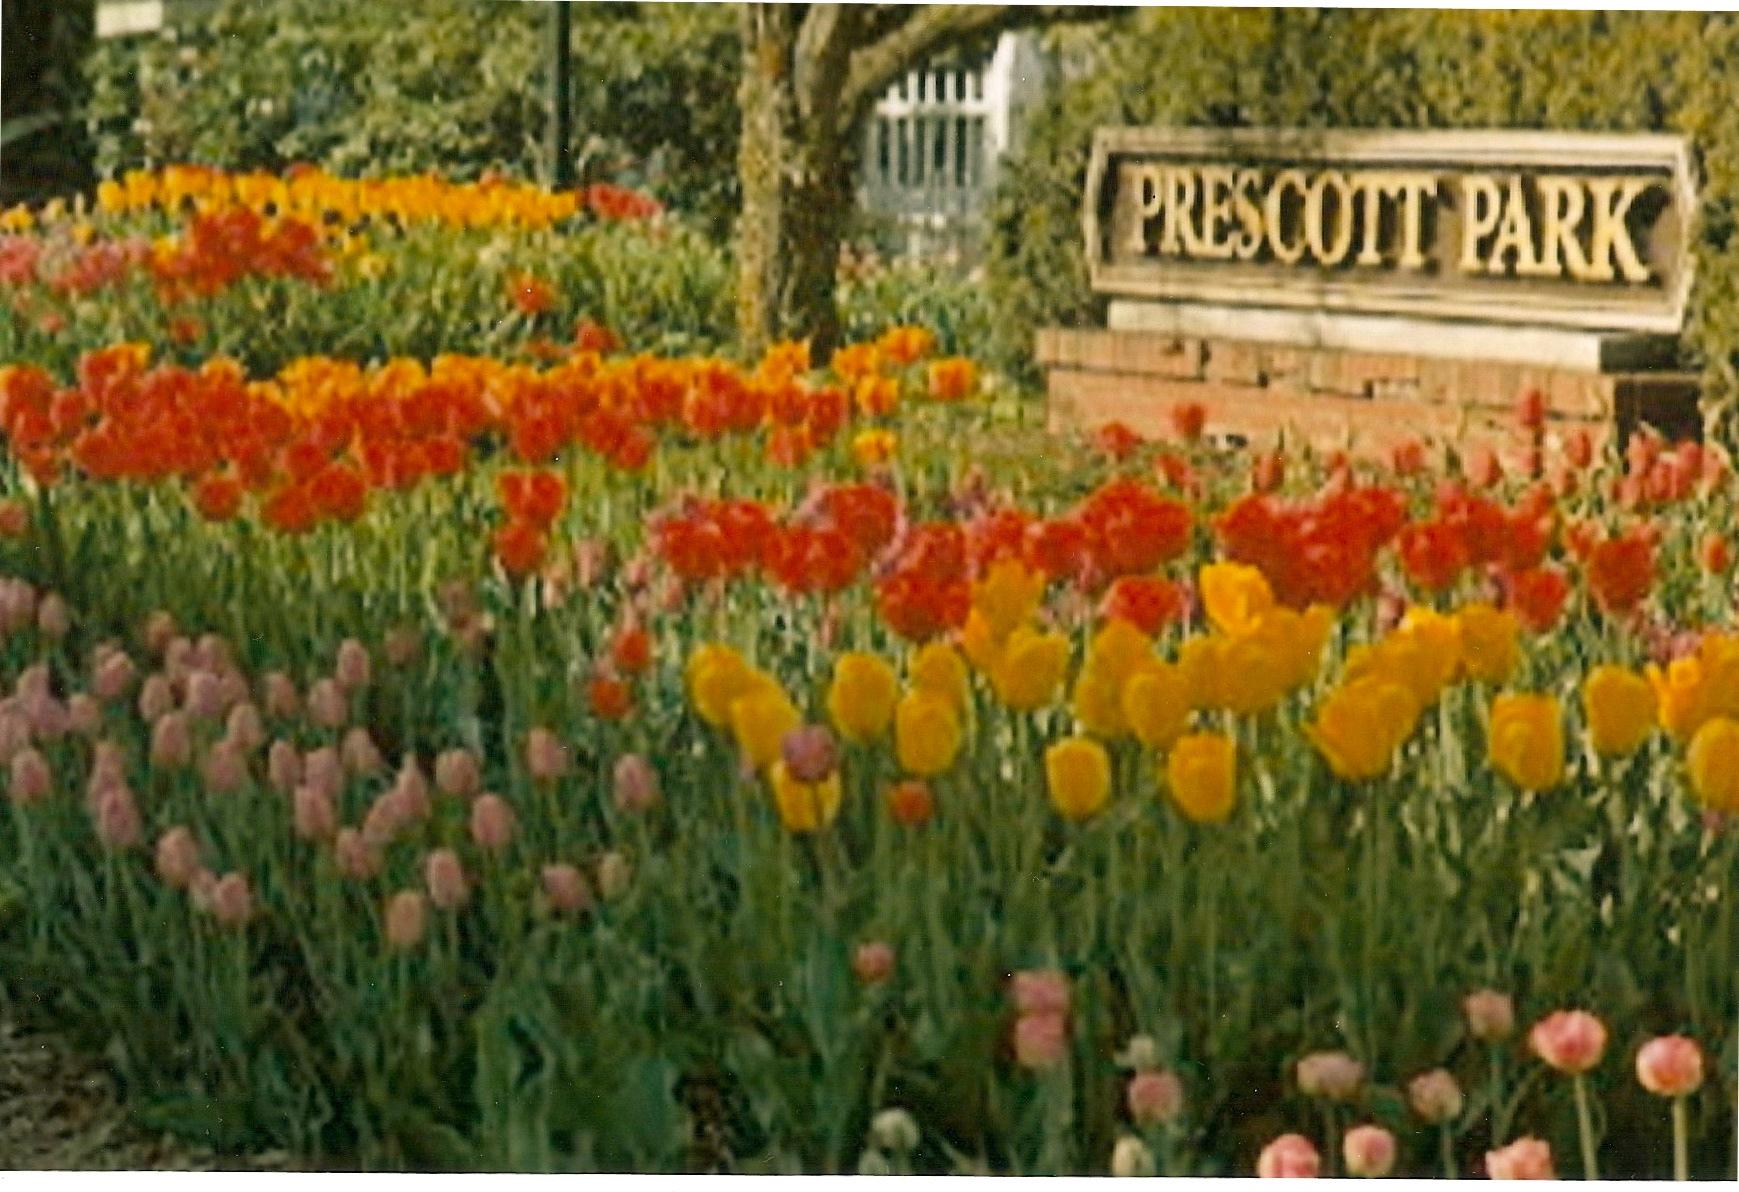 book - Prescott Park